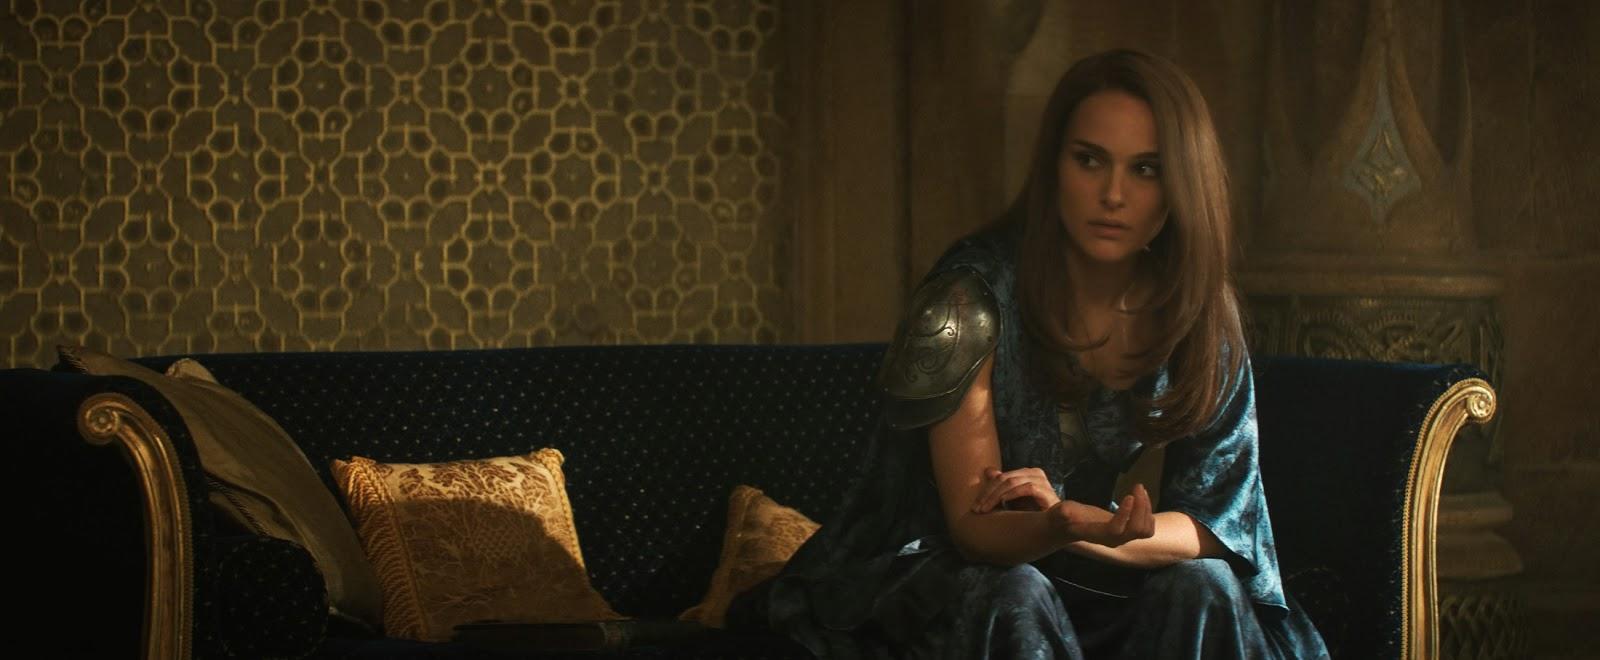 'Thor: The Dark World' Star Natalie Portman Sets Record ... |Natalie Portman Thor The Dark World